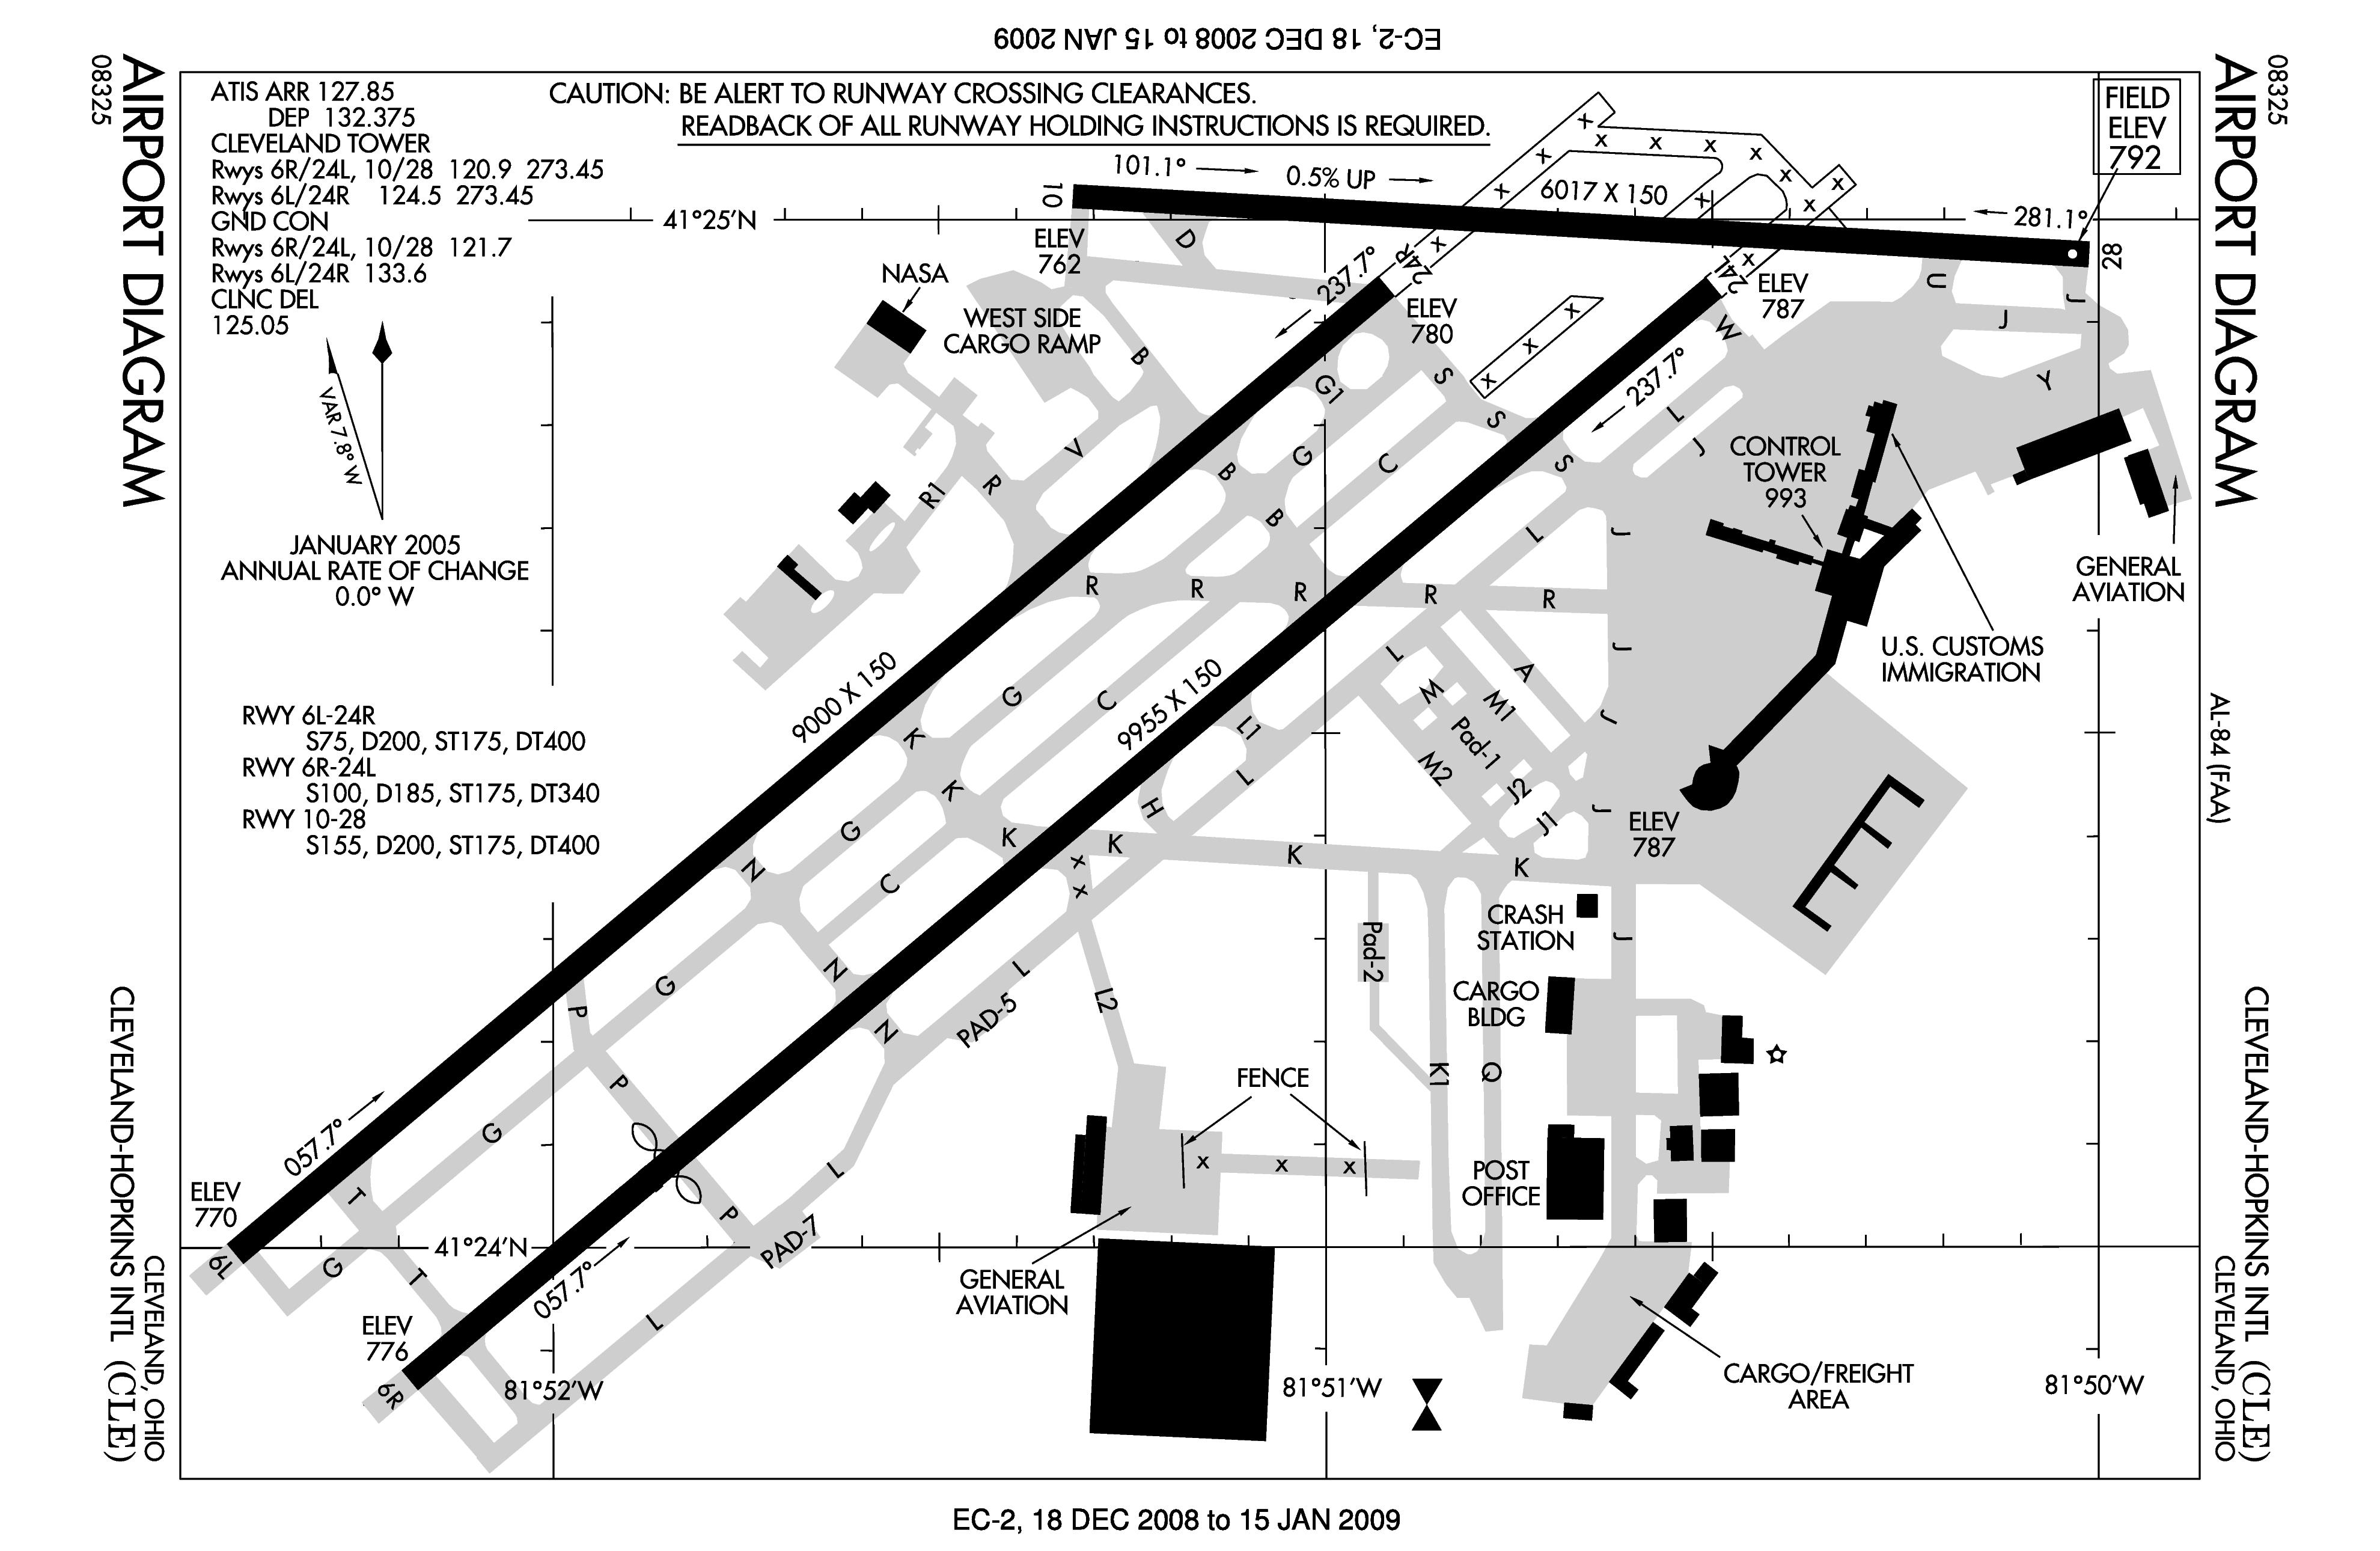 Cleveland Hopkins Airport Diagram